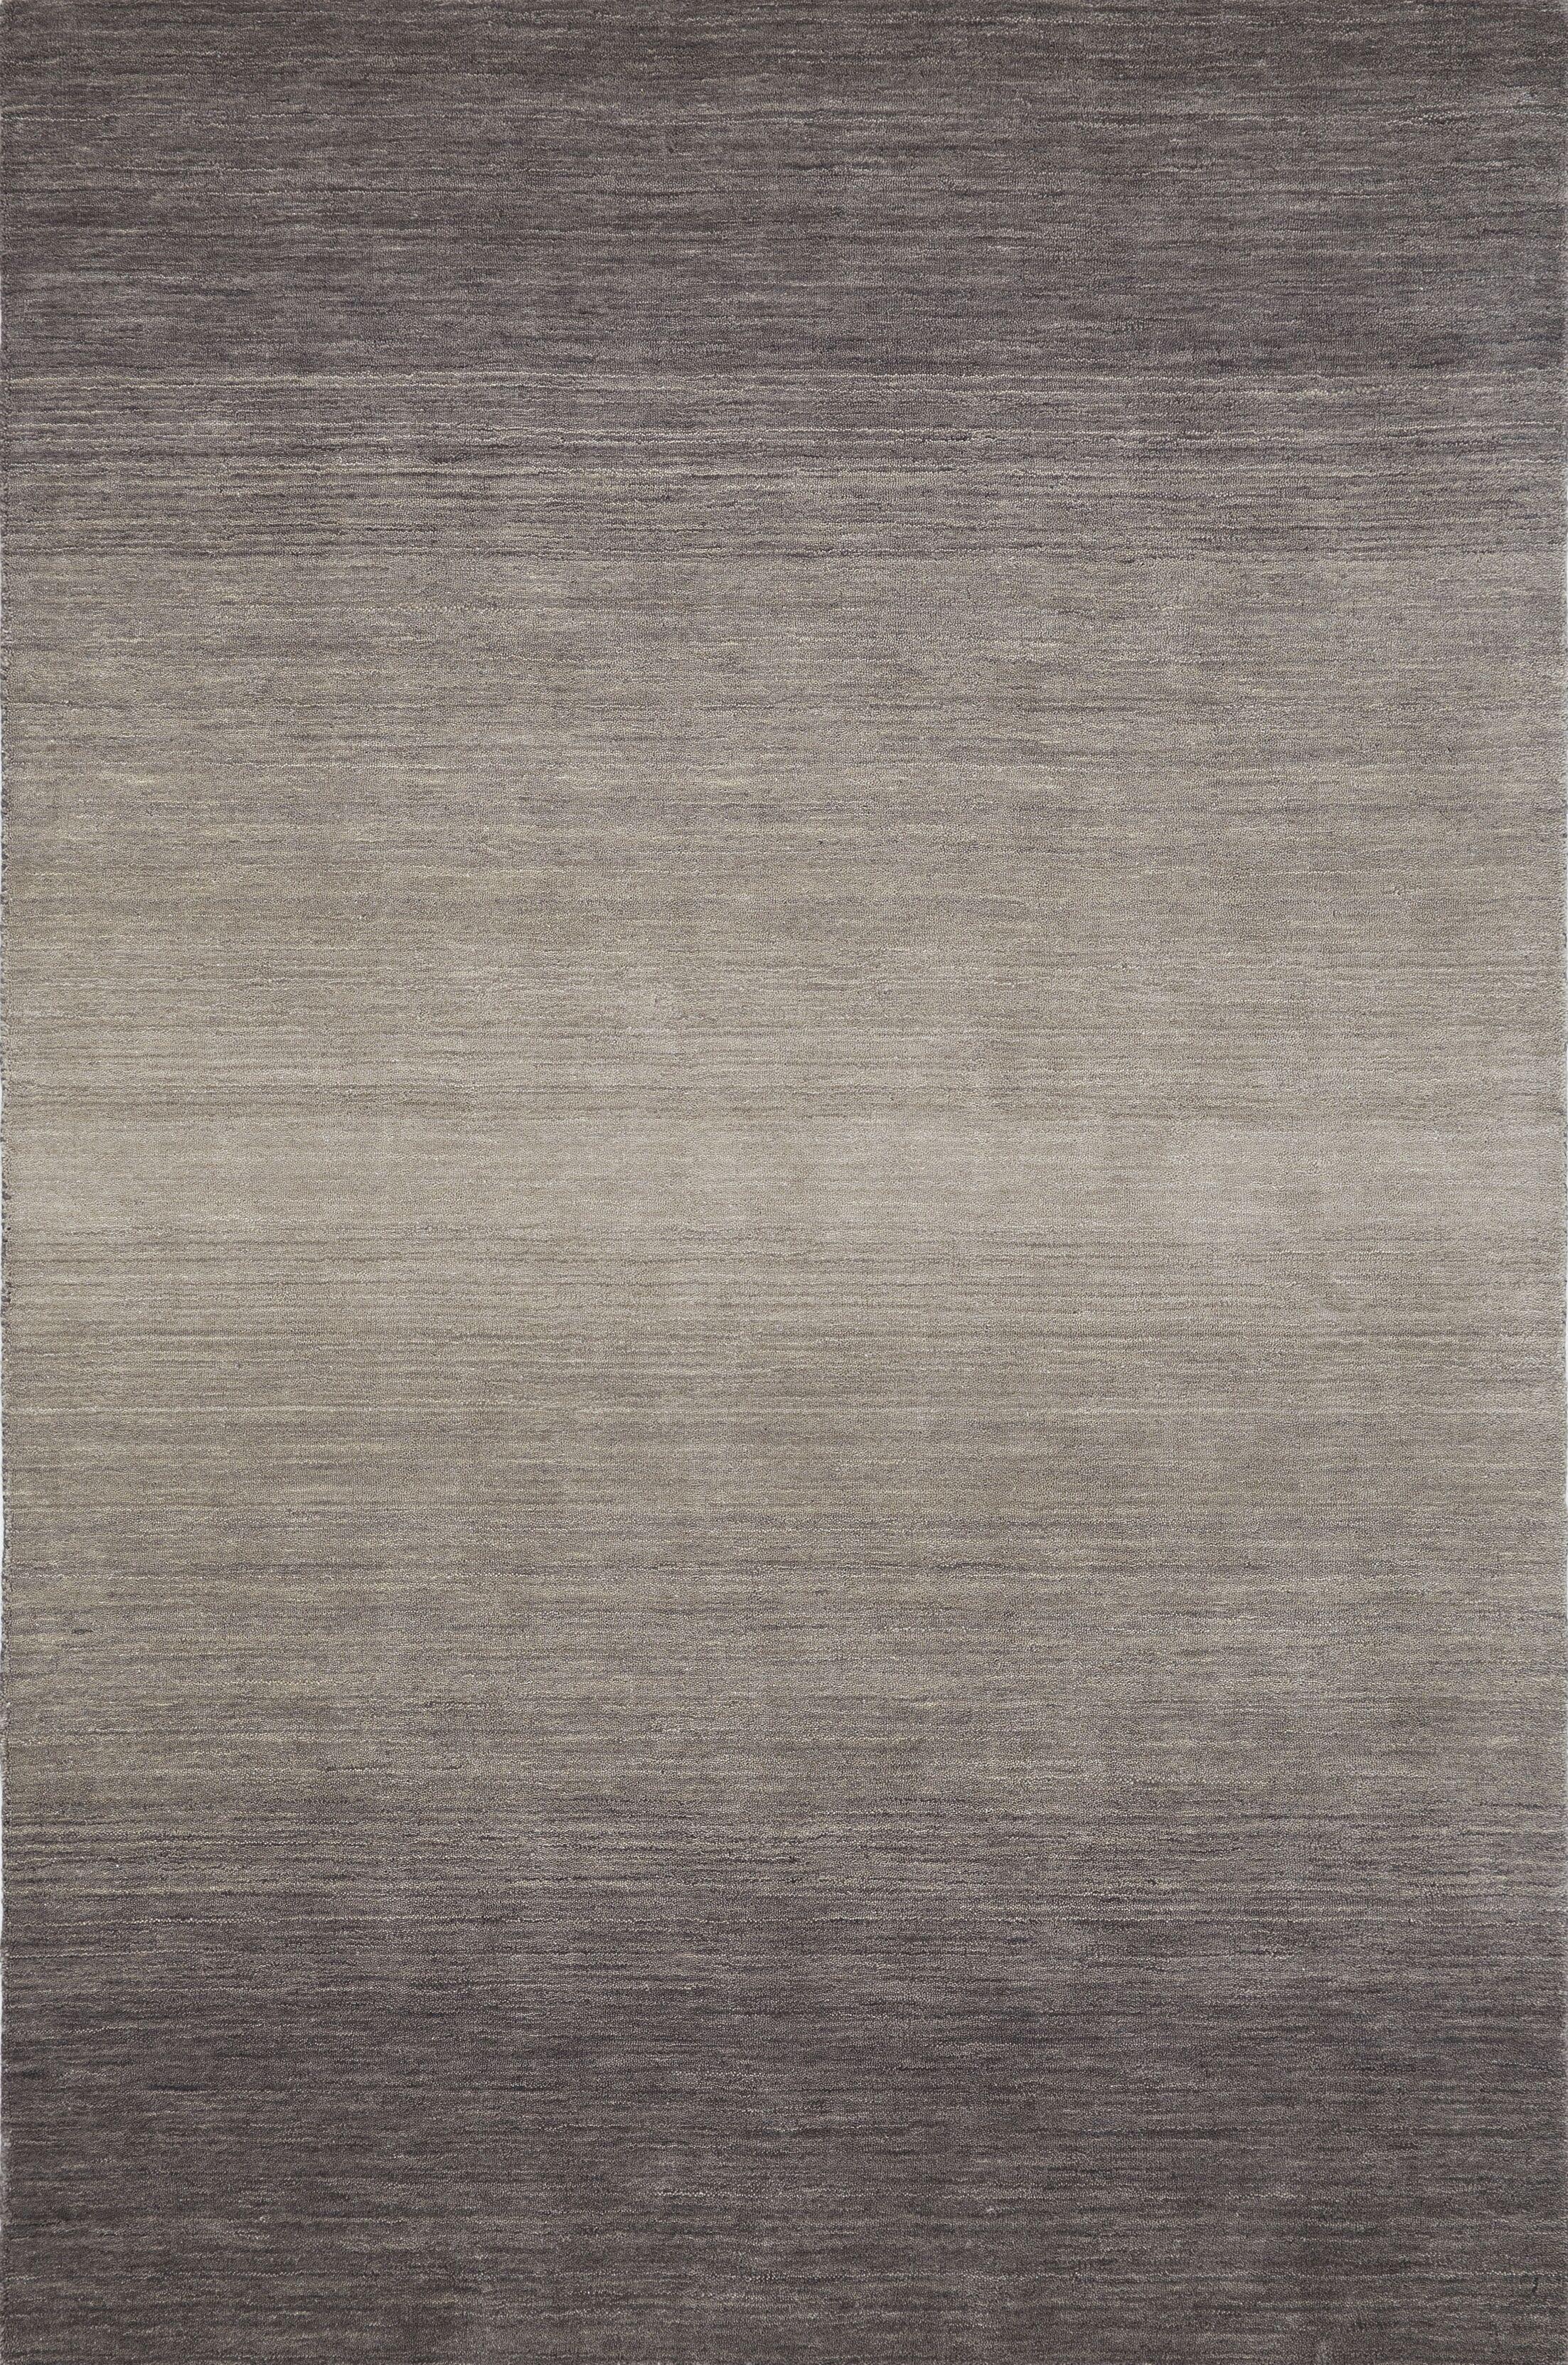 Louisa Hand Woven Wool Ash Area Rug Rug Size: Rectangle 7'9